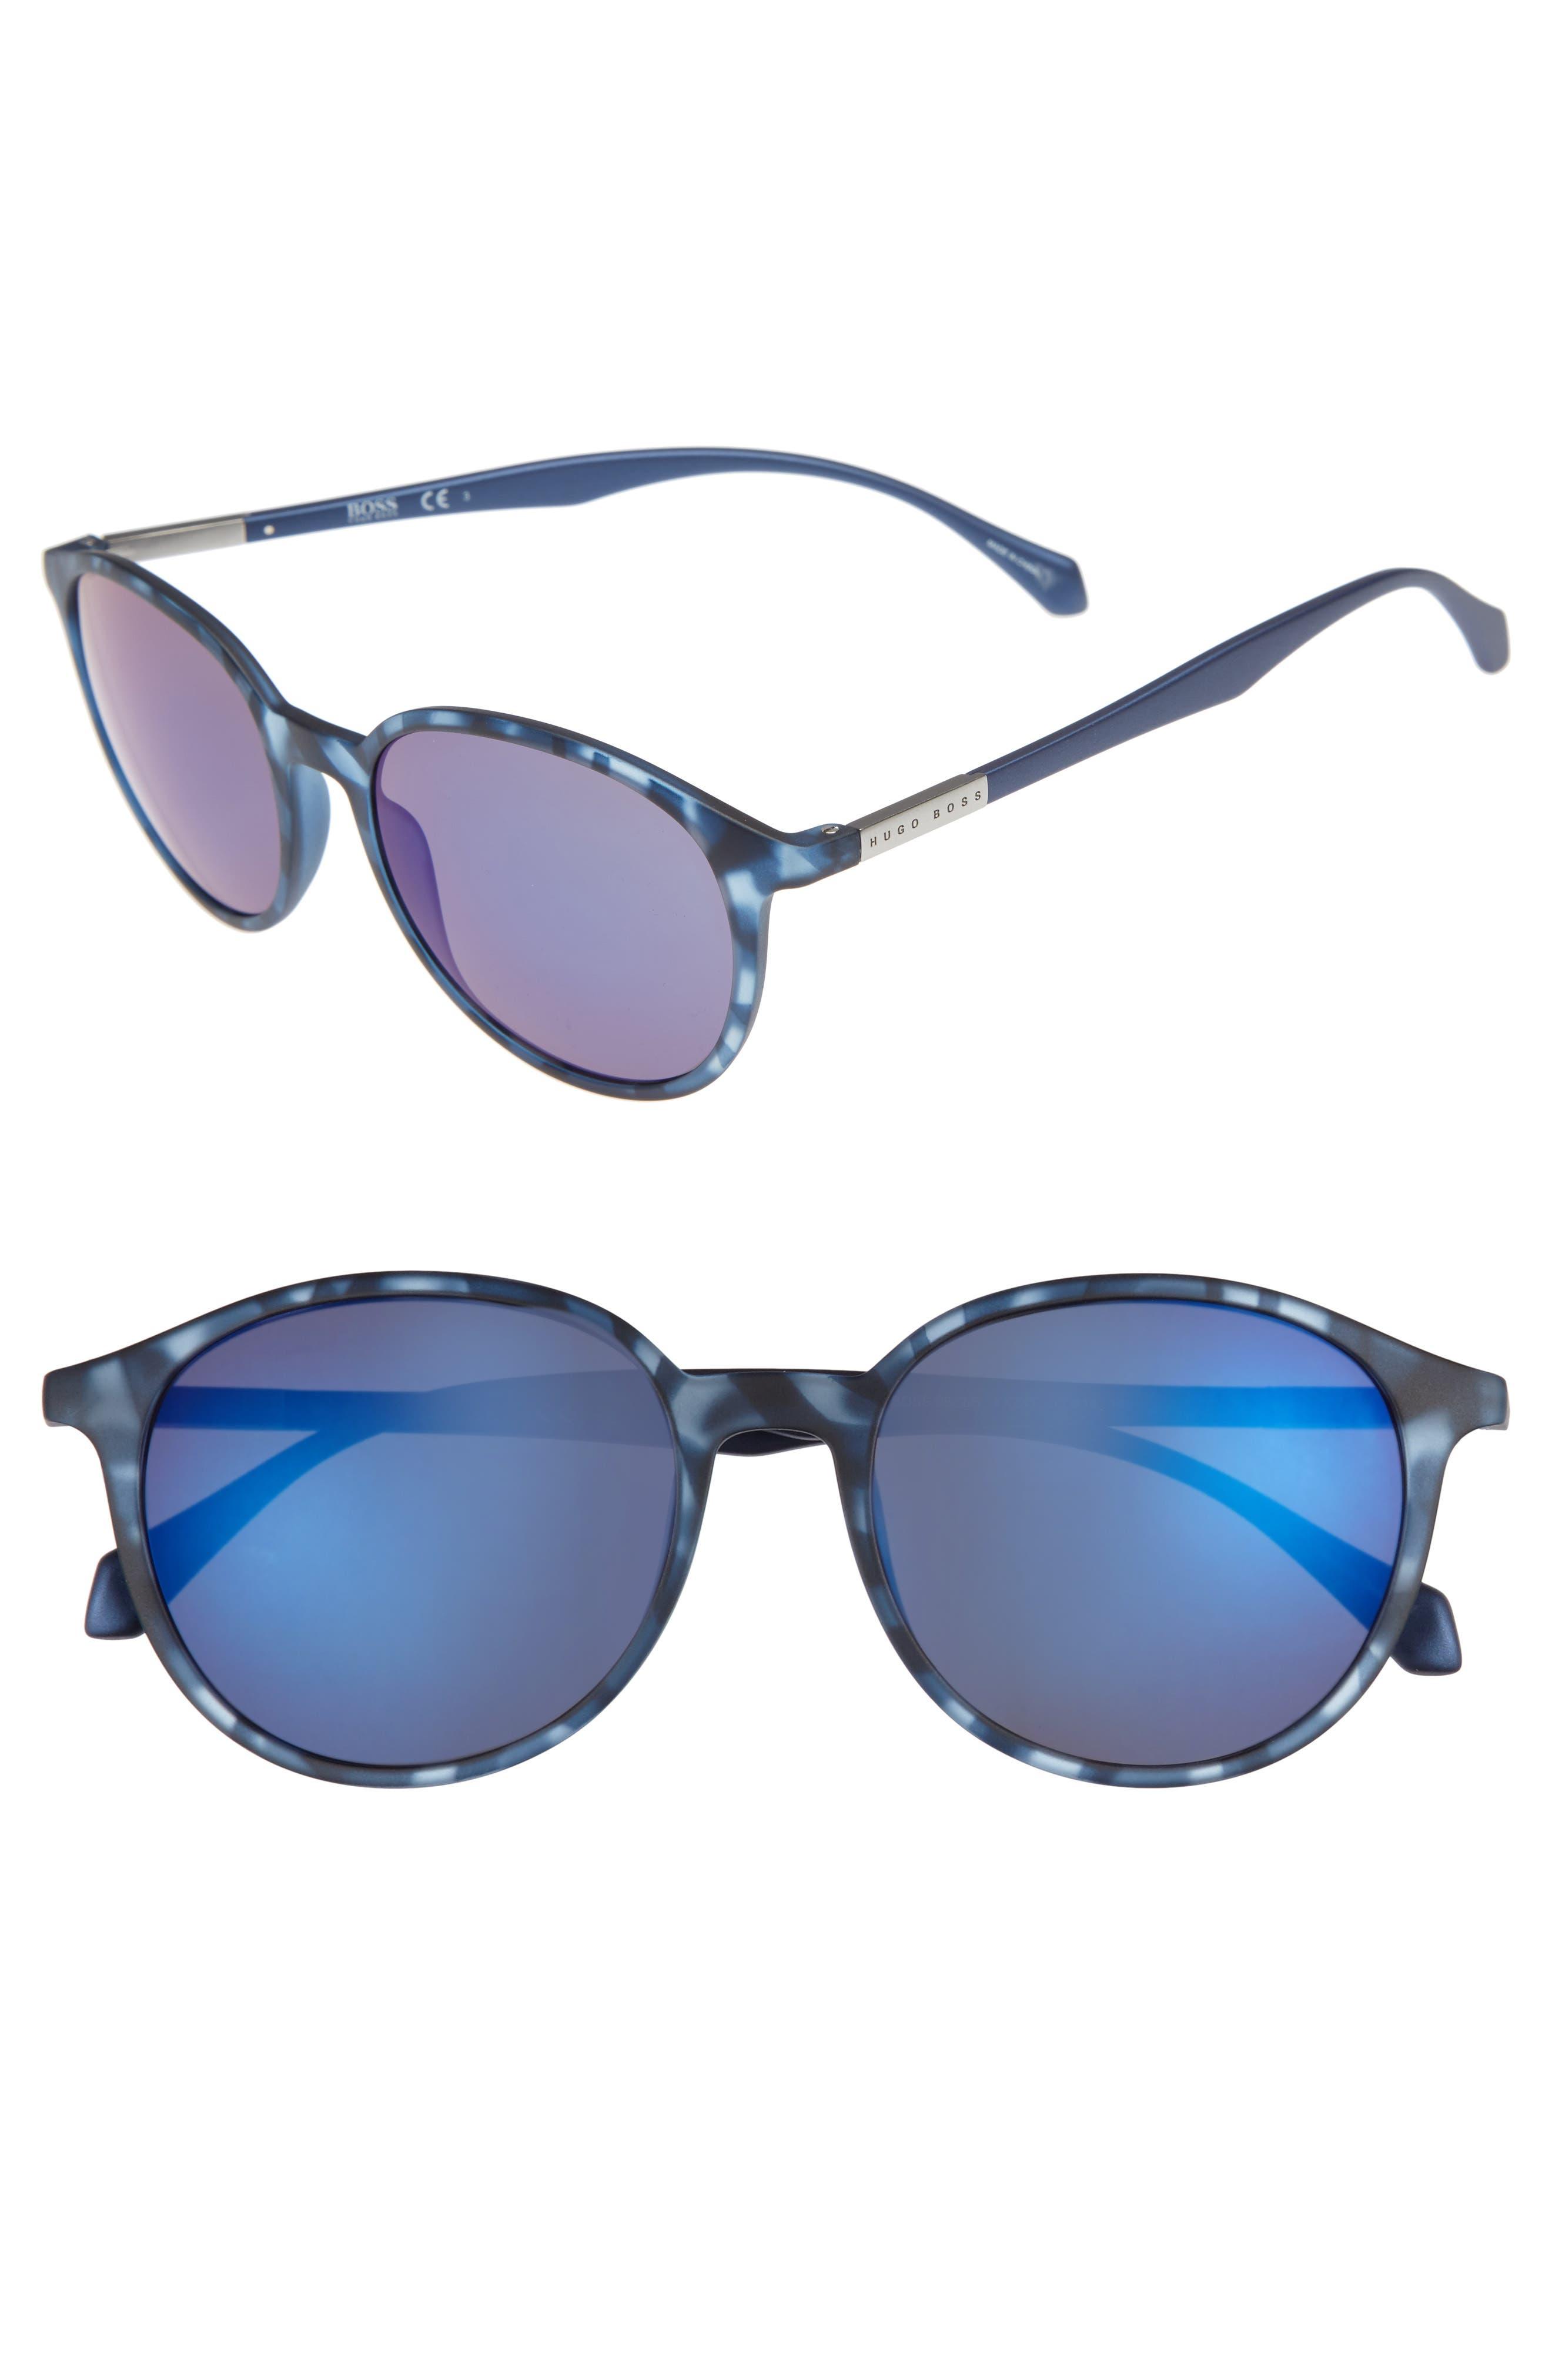 BOSS 53mm Sunglasses